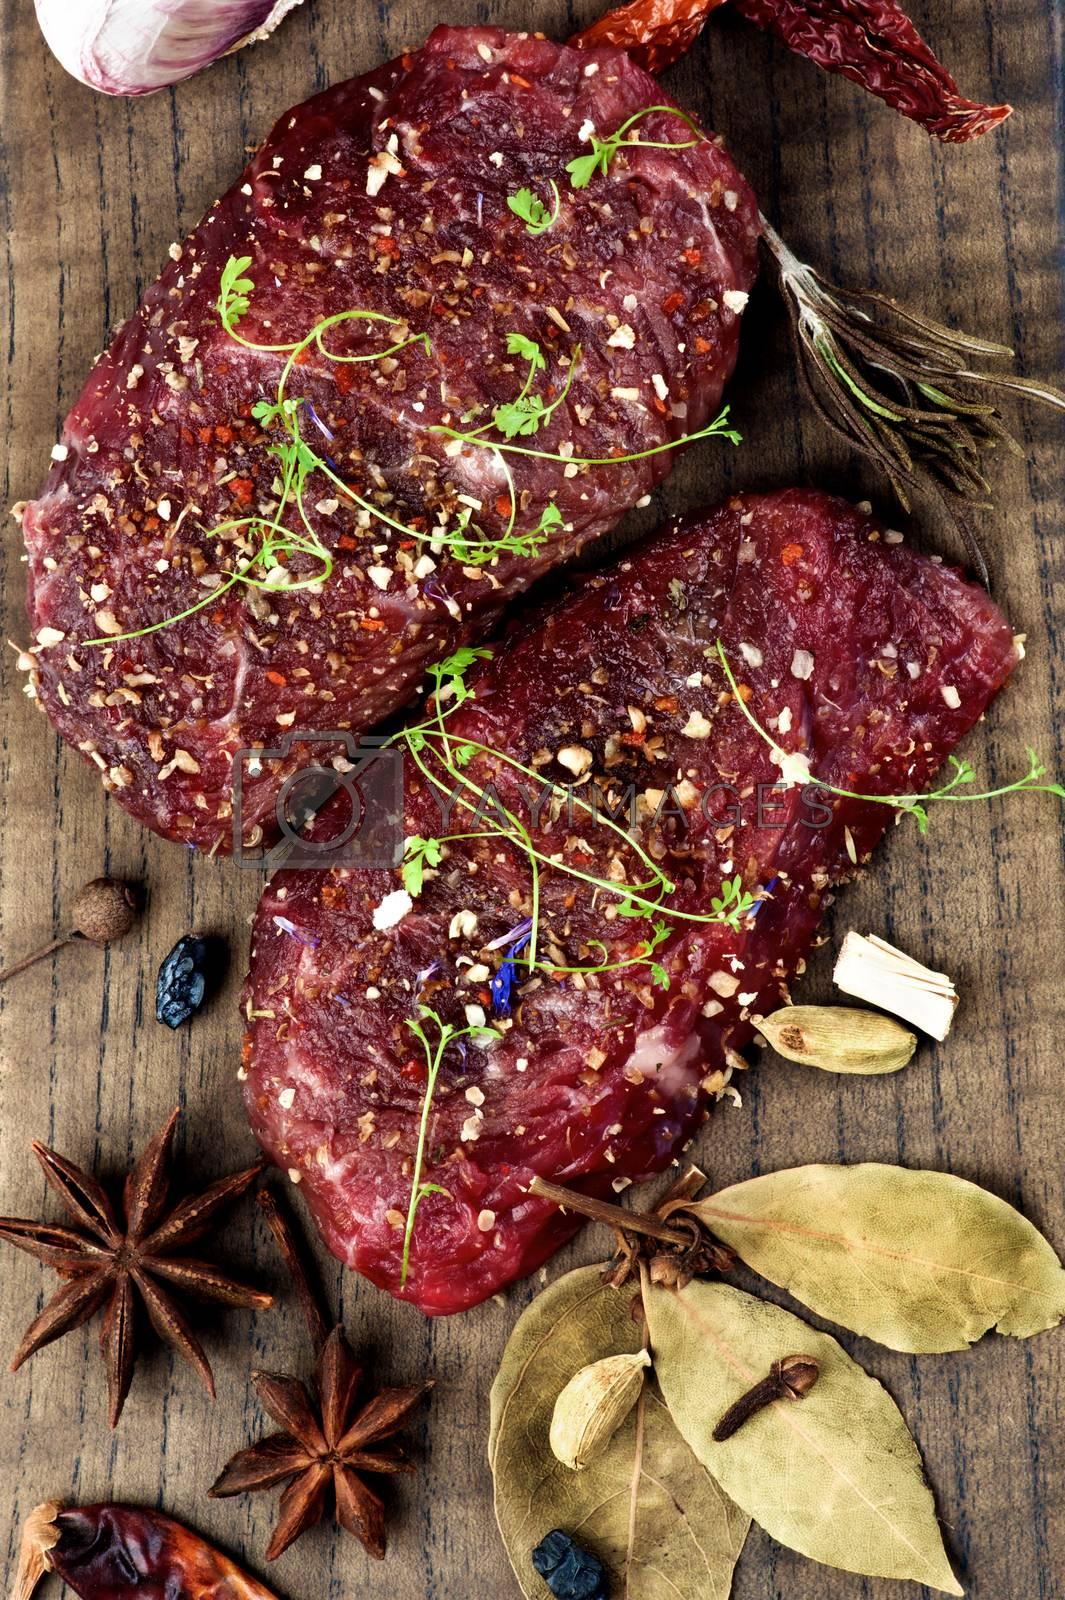 Marinated Raw Beef by zhekos